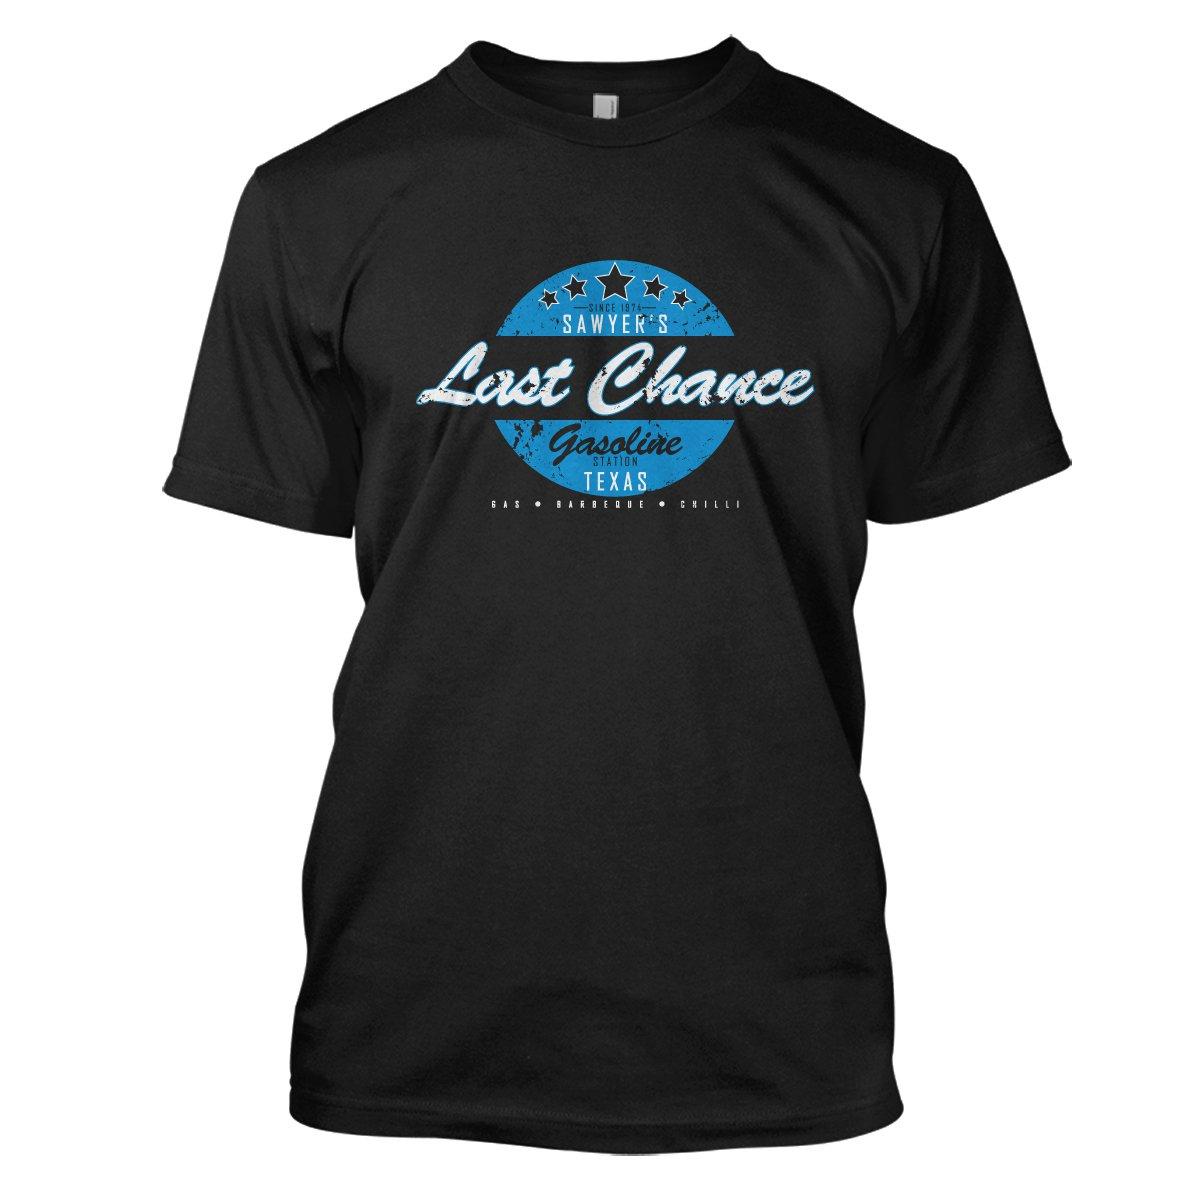 Texas Chainsaw Massacre: Last Chance Gas Mens Movie T-Shirt Large Black